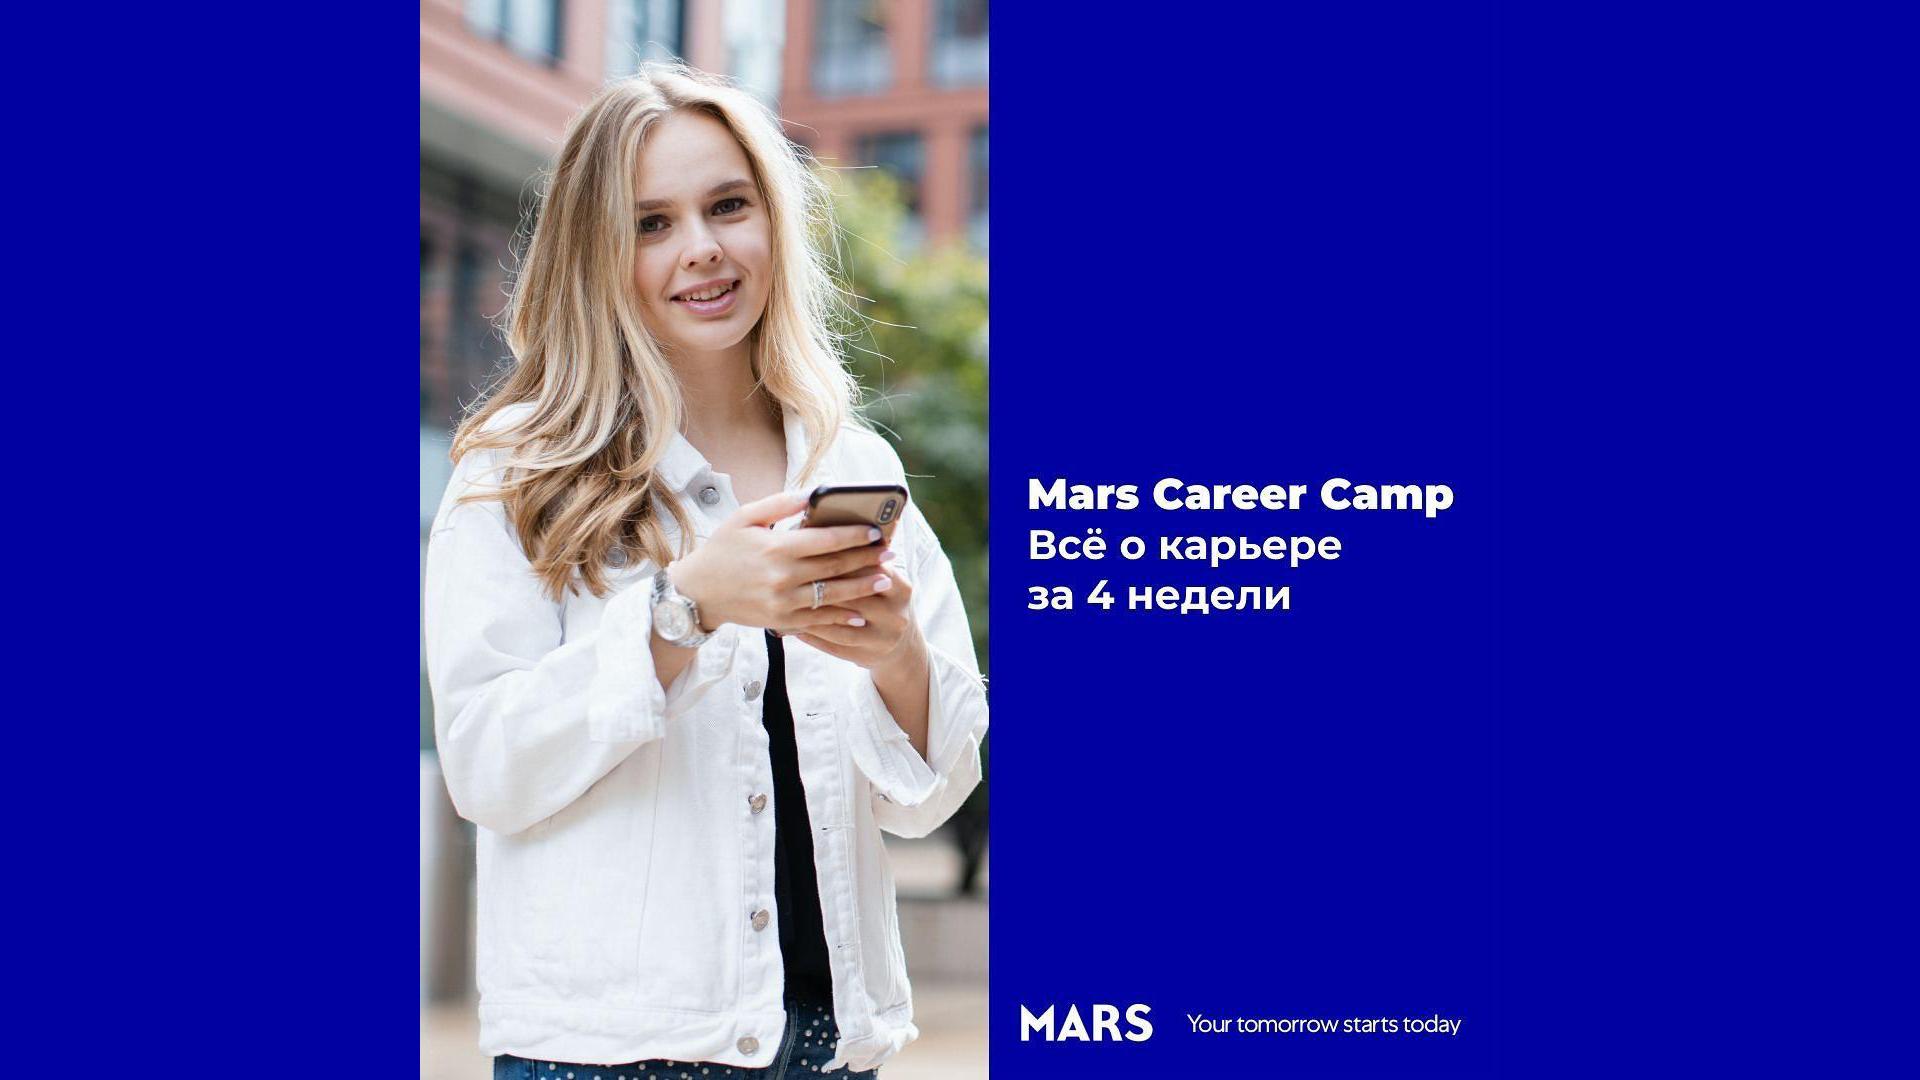 Mars Career Camp